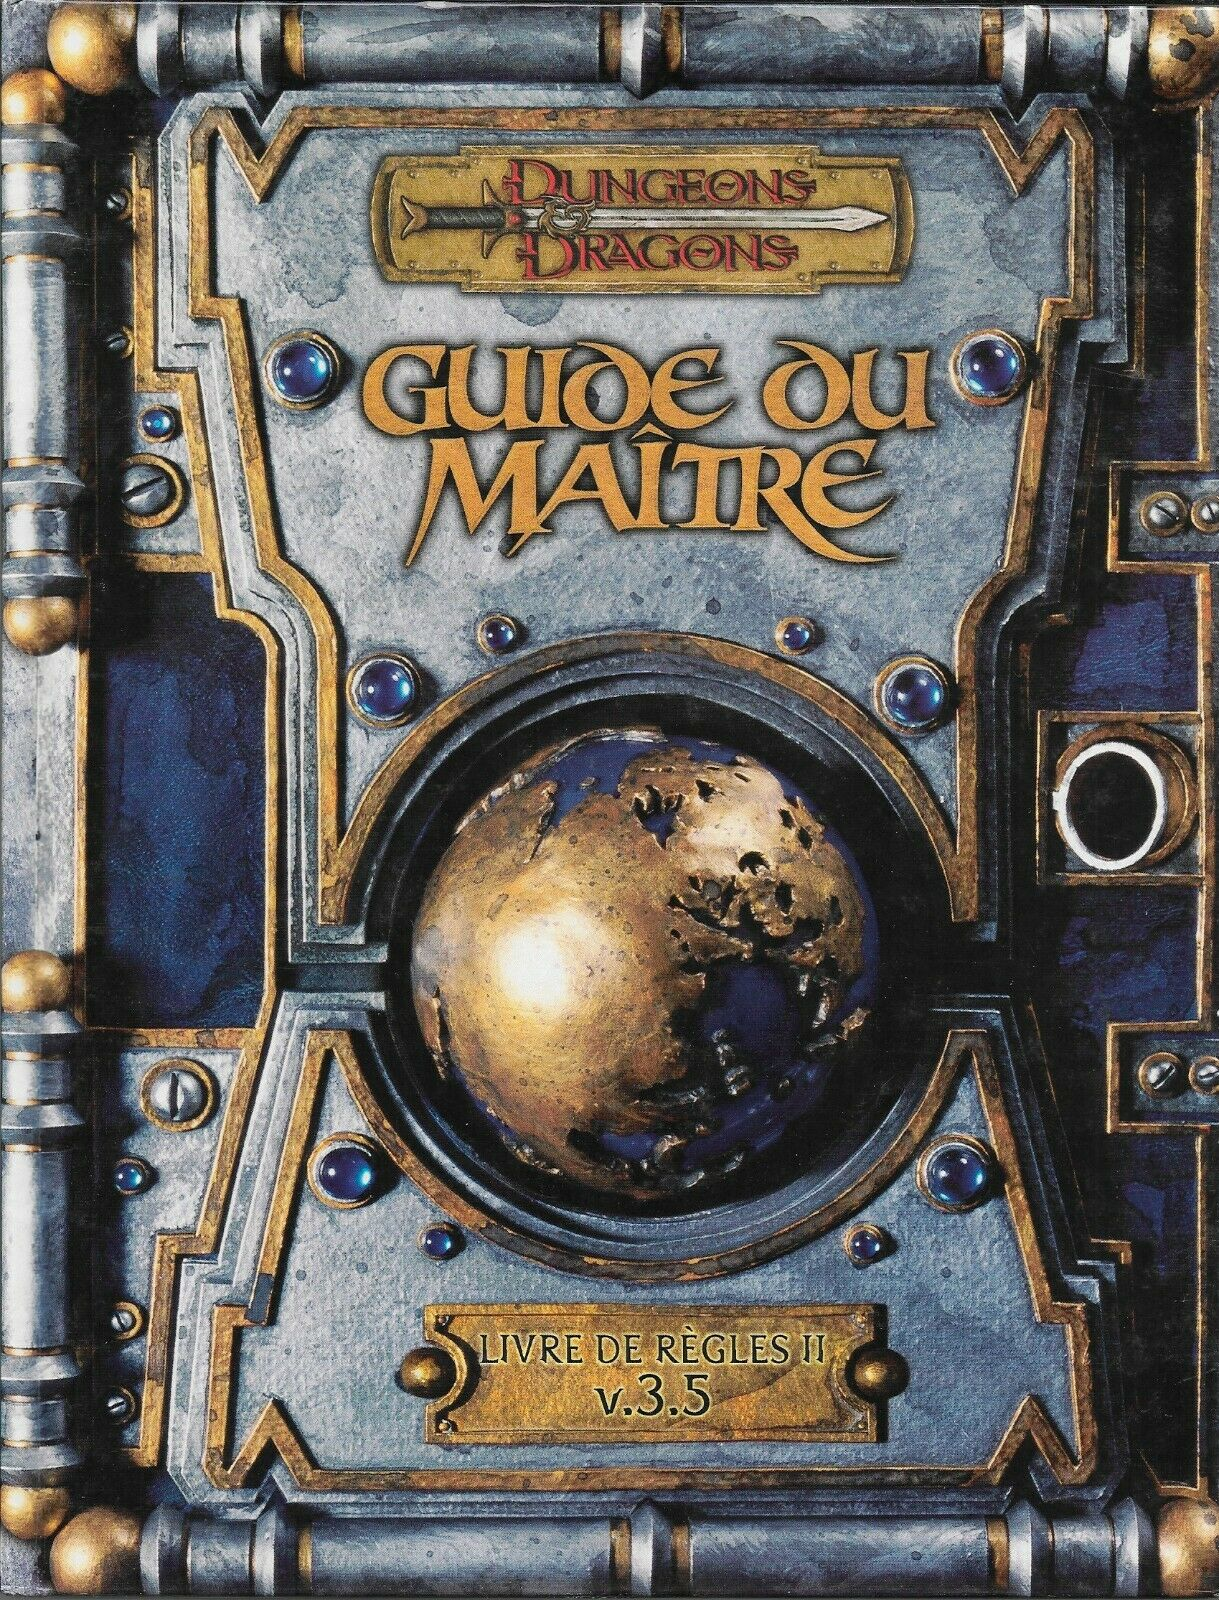 DUNGEONS & drakeER -- GUIDE DU MAATER - EDITERING 3.5 ‐NEUF